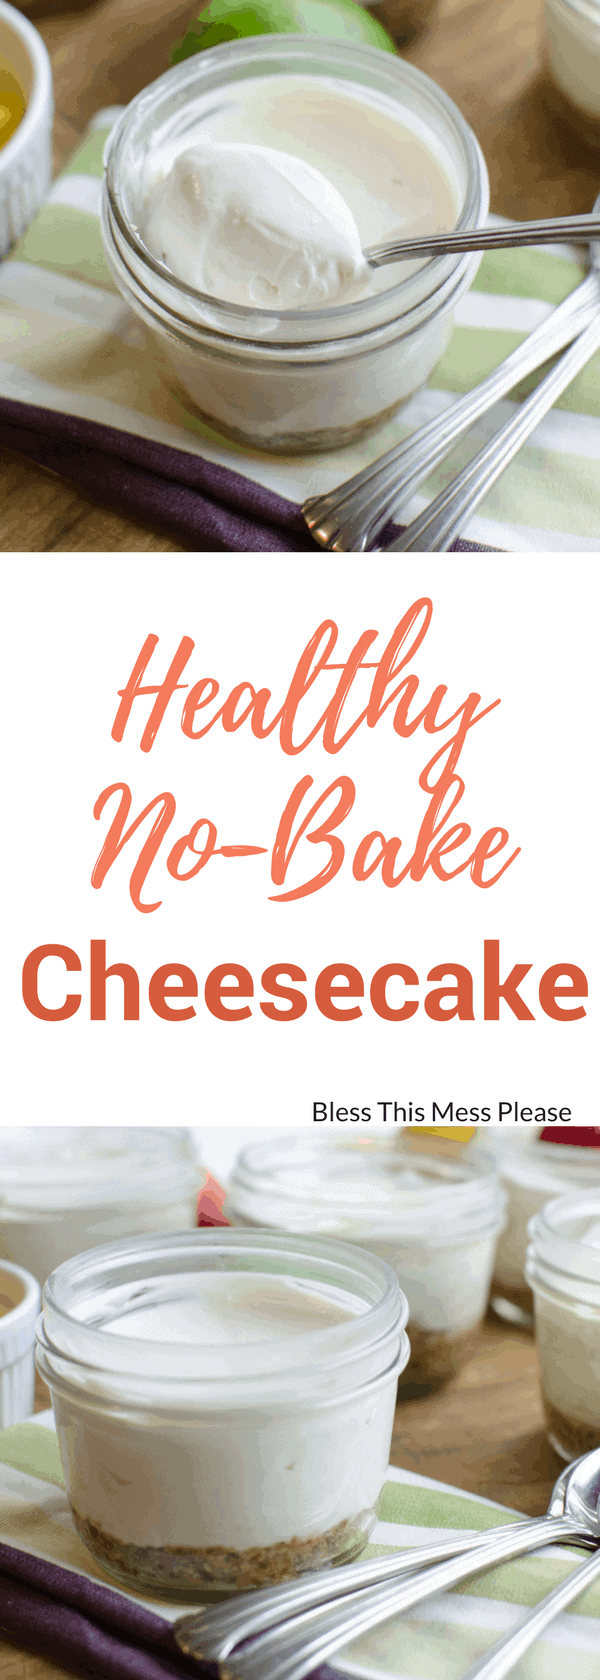 Healthy No-Bake Cheesecake